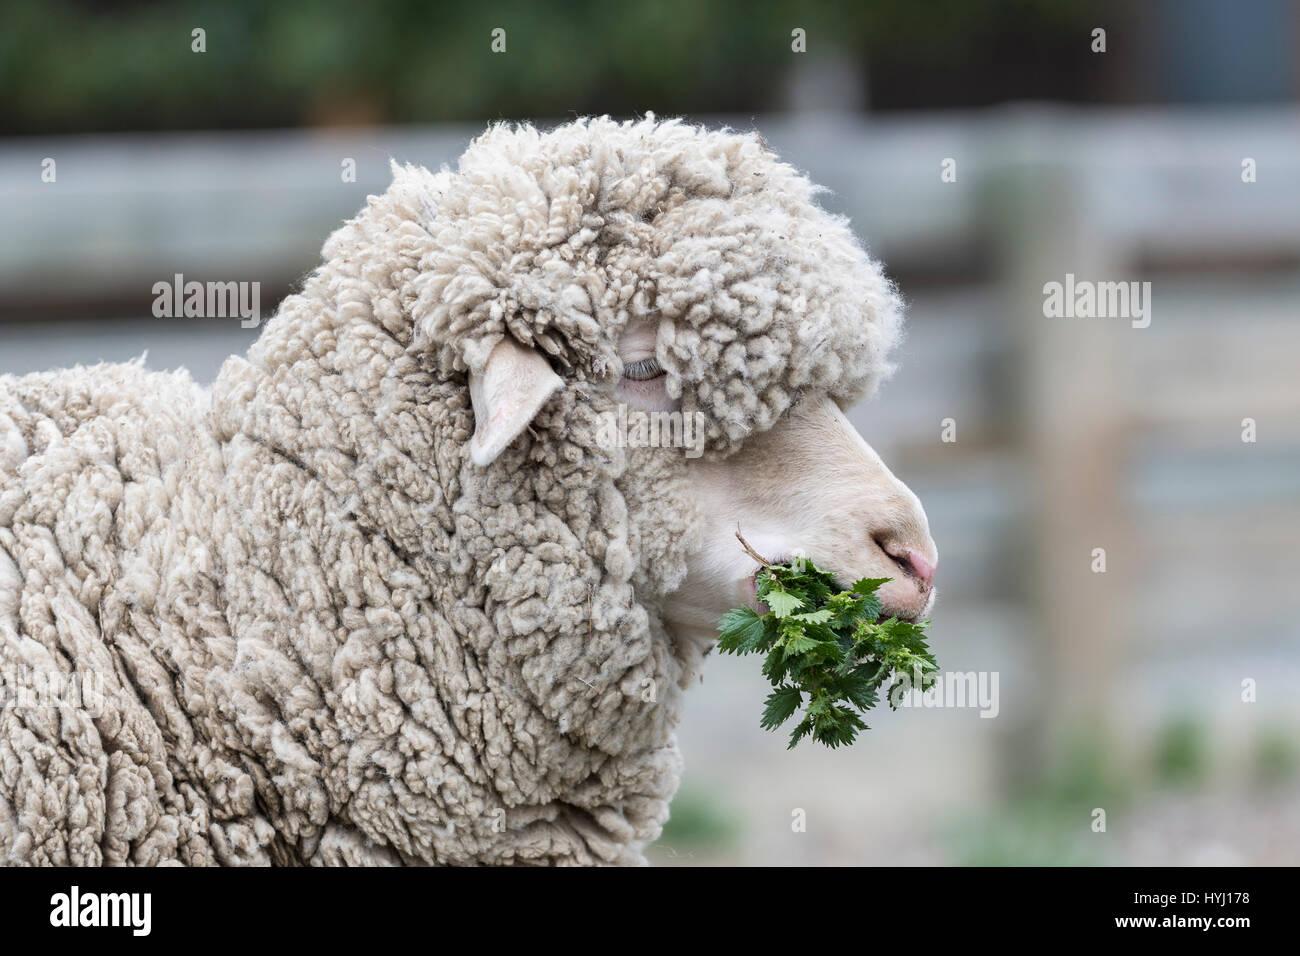 Merino sheep feeding on nettles, Southland, New Zealand - Stock Image